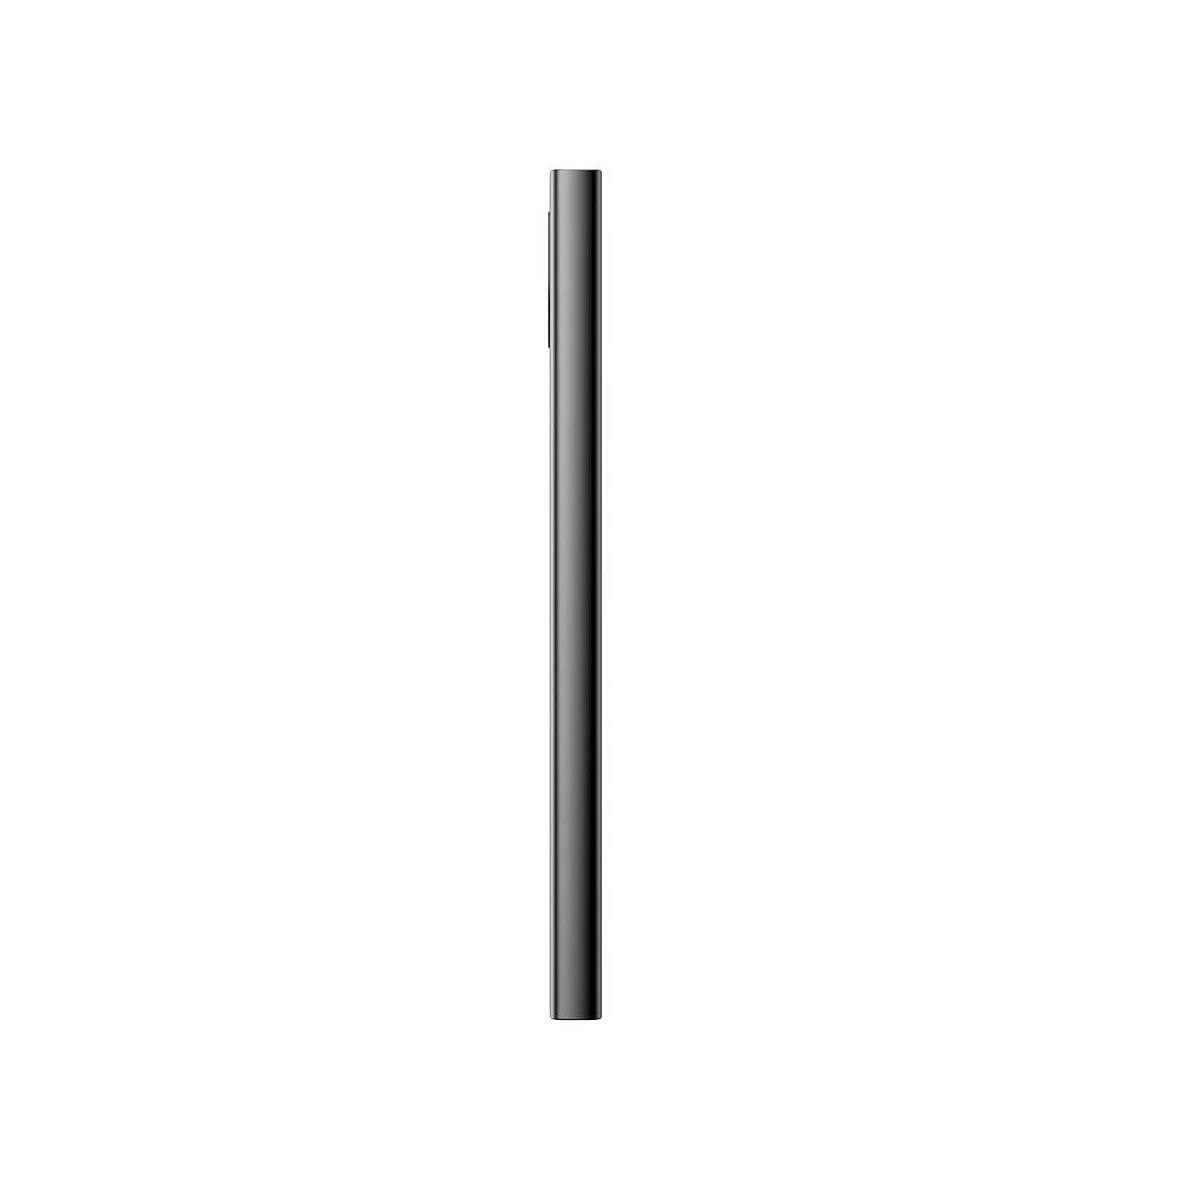 Baseus Power Bank Adaman Metal Digitális kijelzős 22.5W 3A 10000 mAh, barna (PPIMDA-B0A)